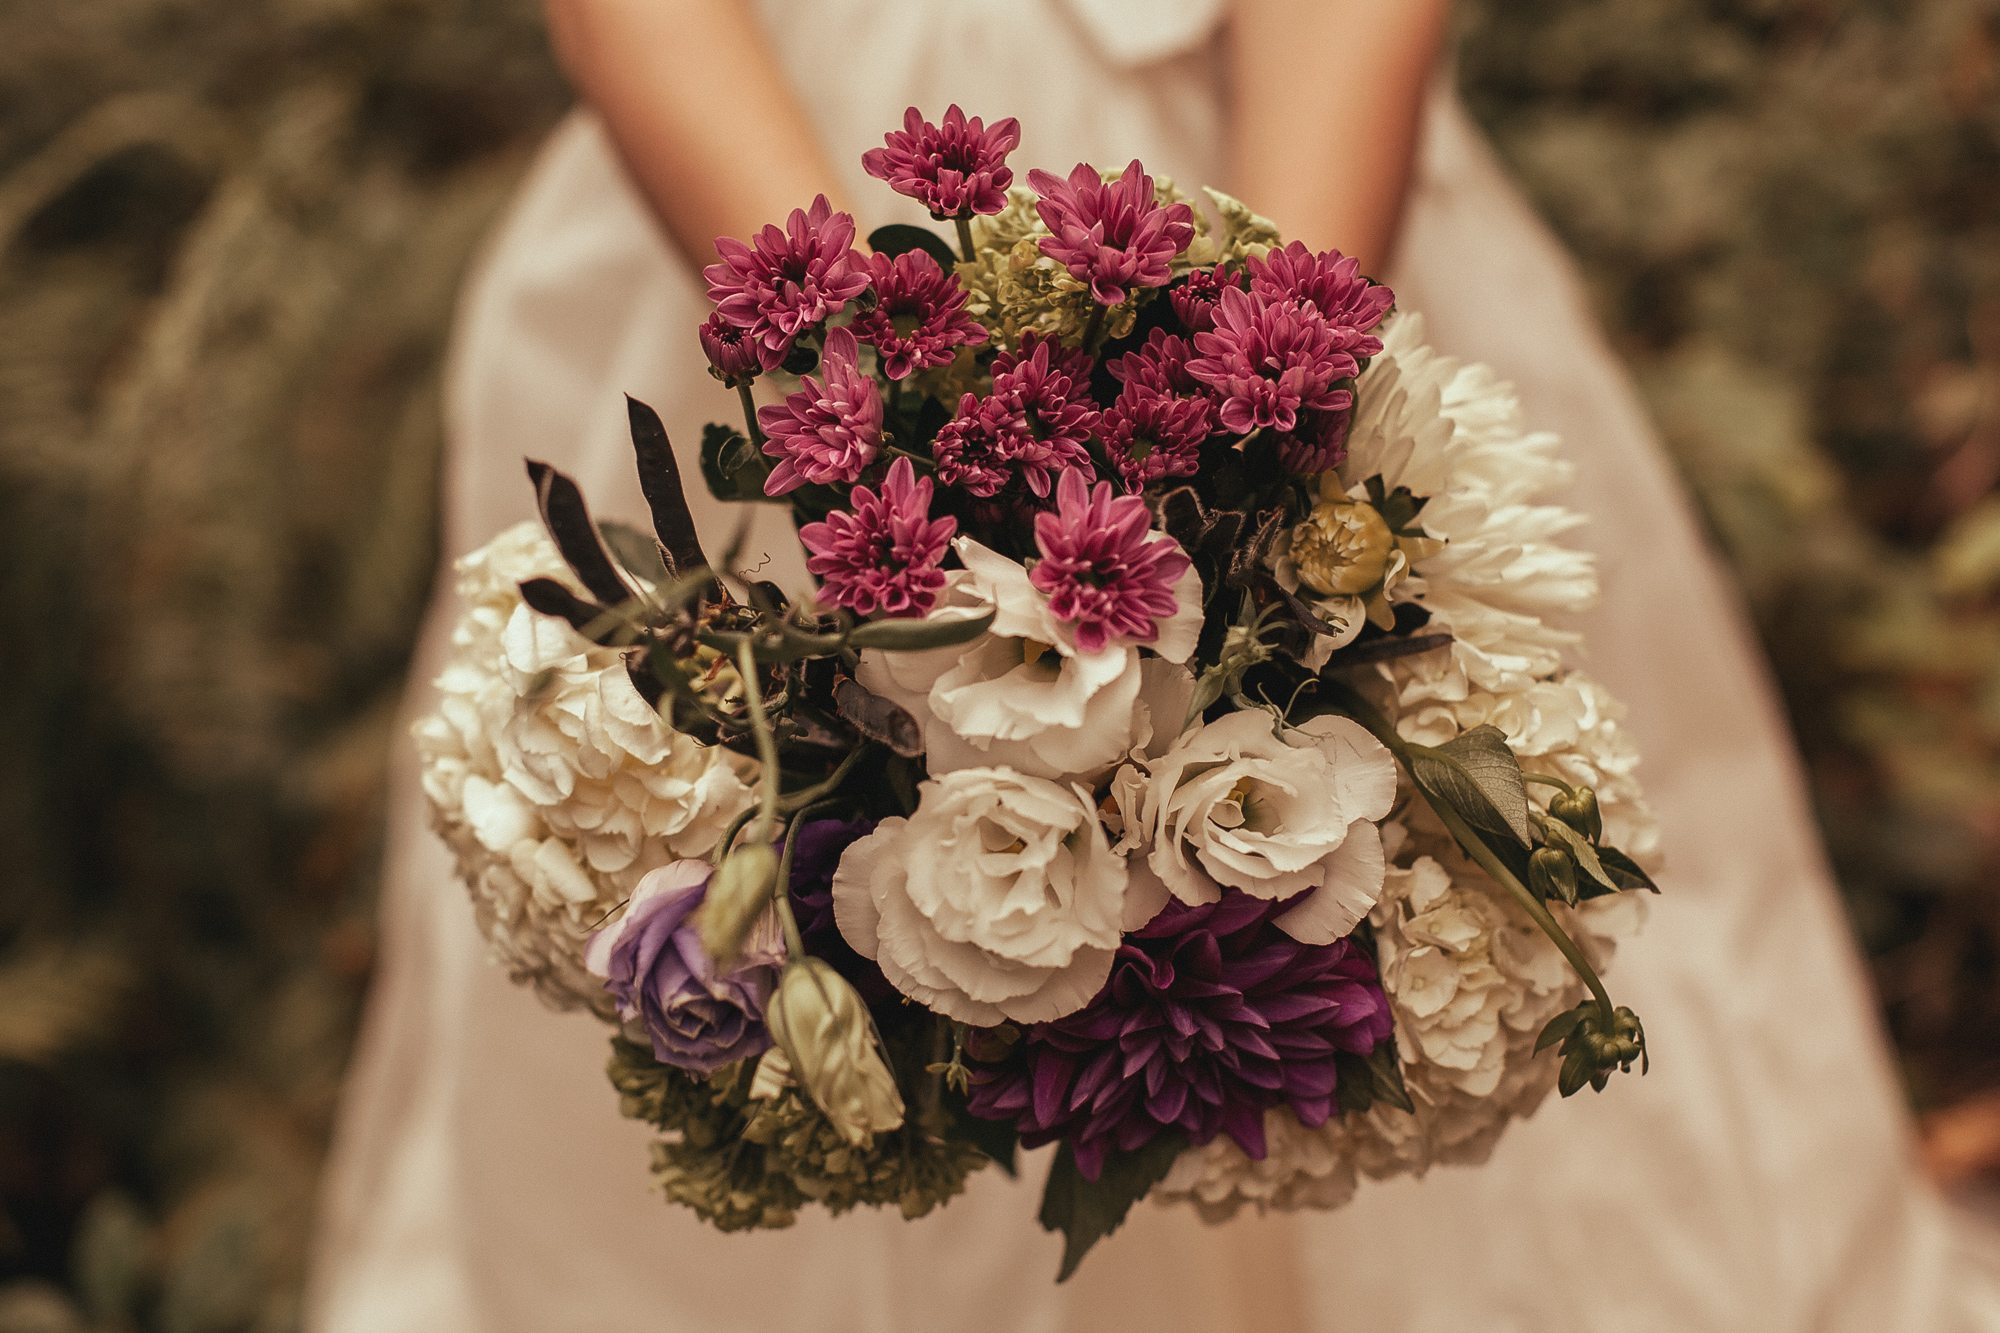 gibsons-wedding-photography-robert-devon44